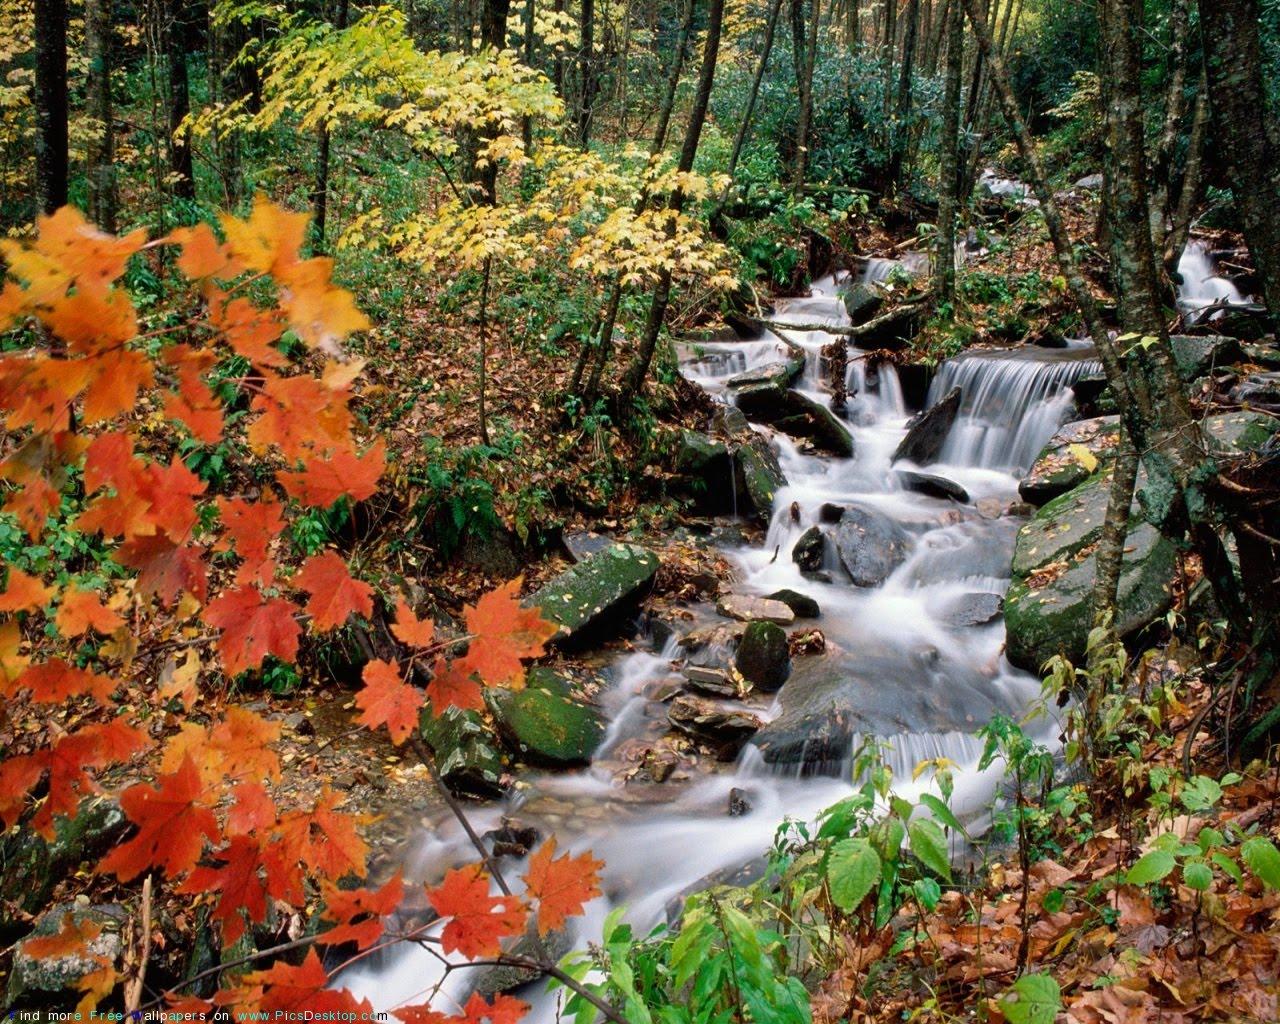 http://4.bp.blogspot.com/__c9qWlUD8Qs/S8N9VNa6oPI/AAAAAAAAFaw/YCkM_QHPcaY/s1600/Waterfalls+Wallpapers_15.jpg